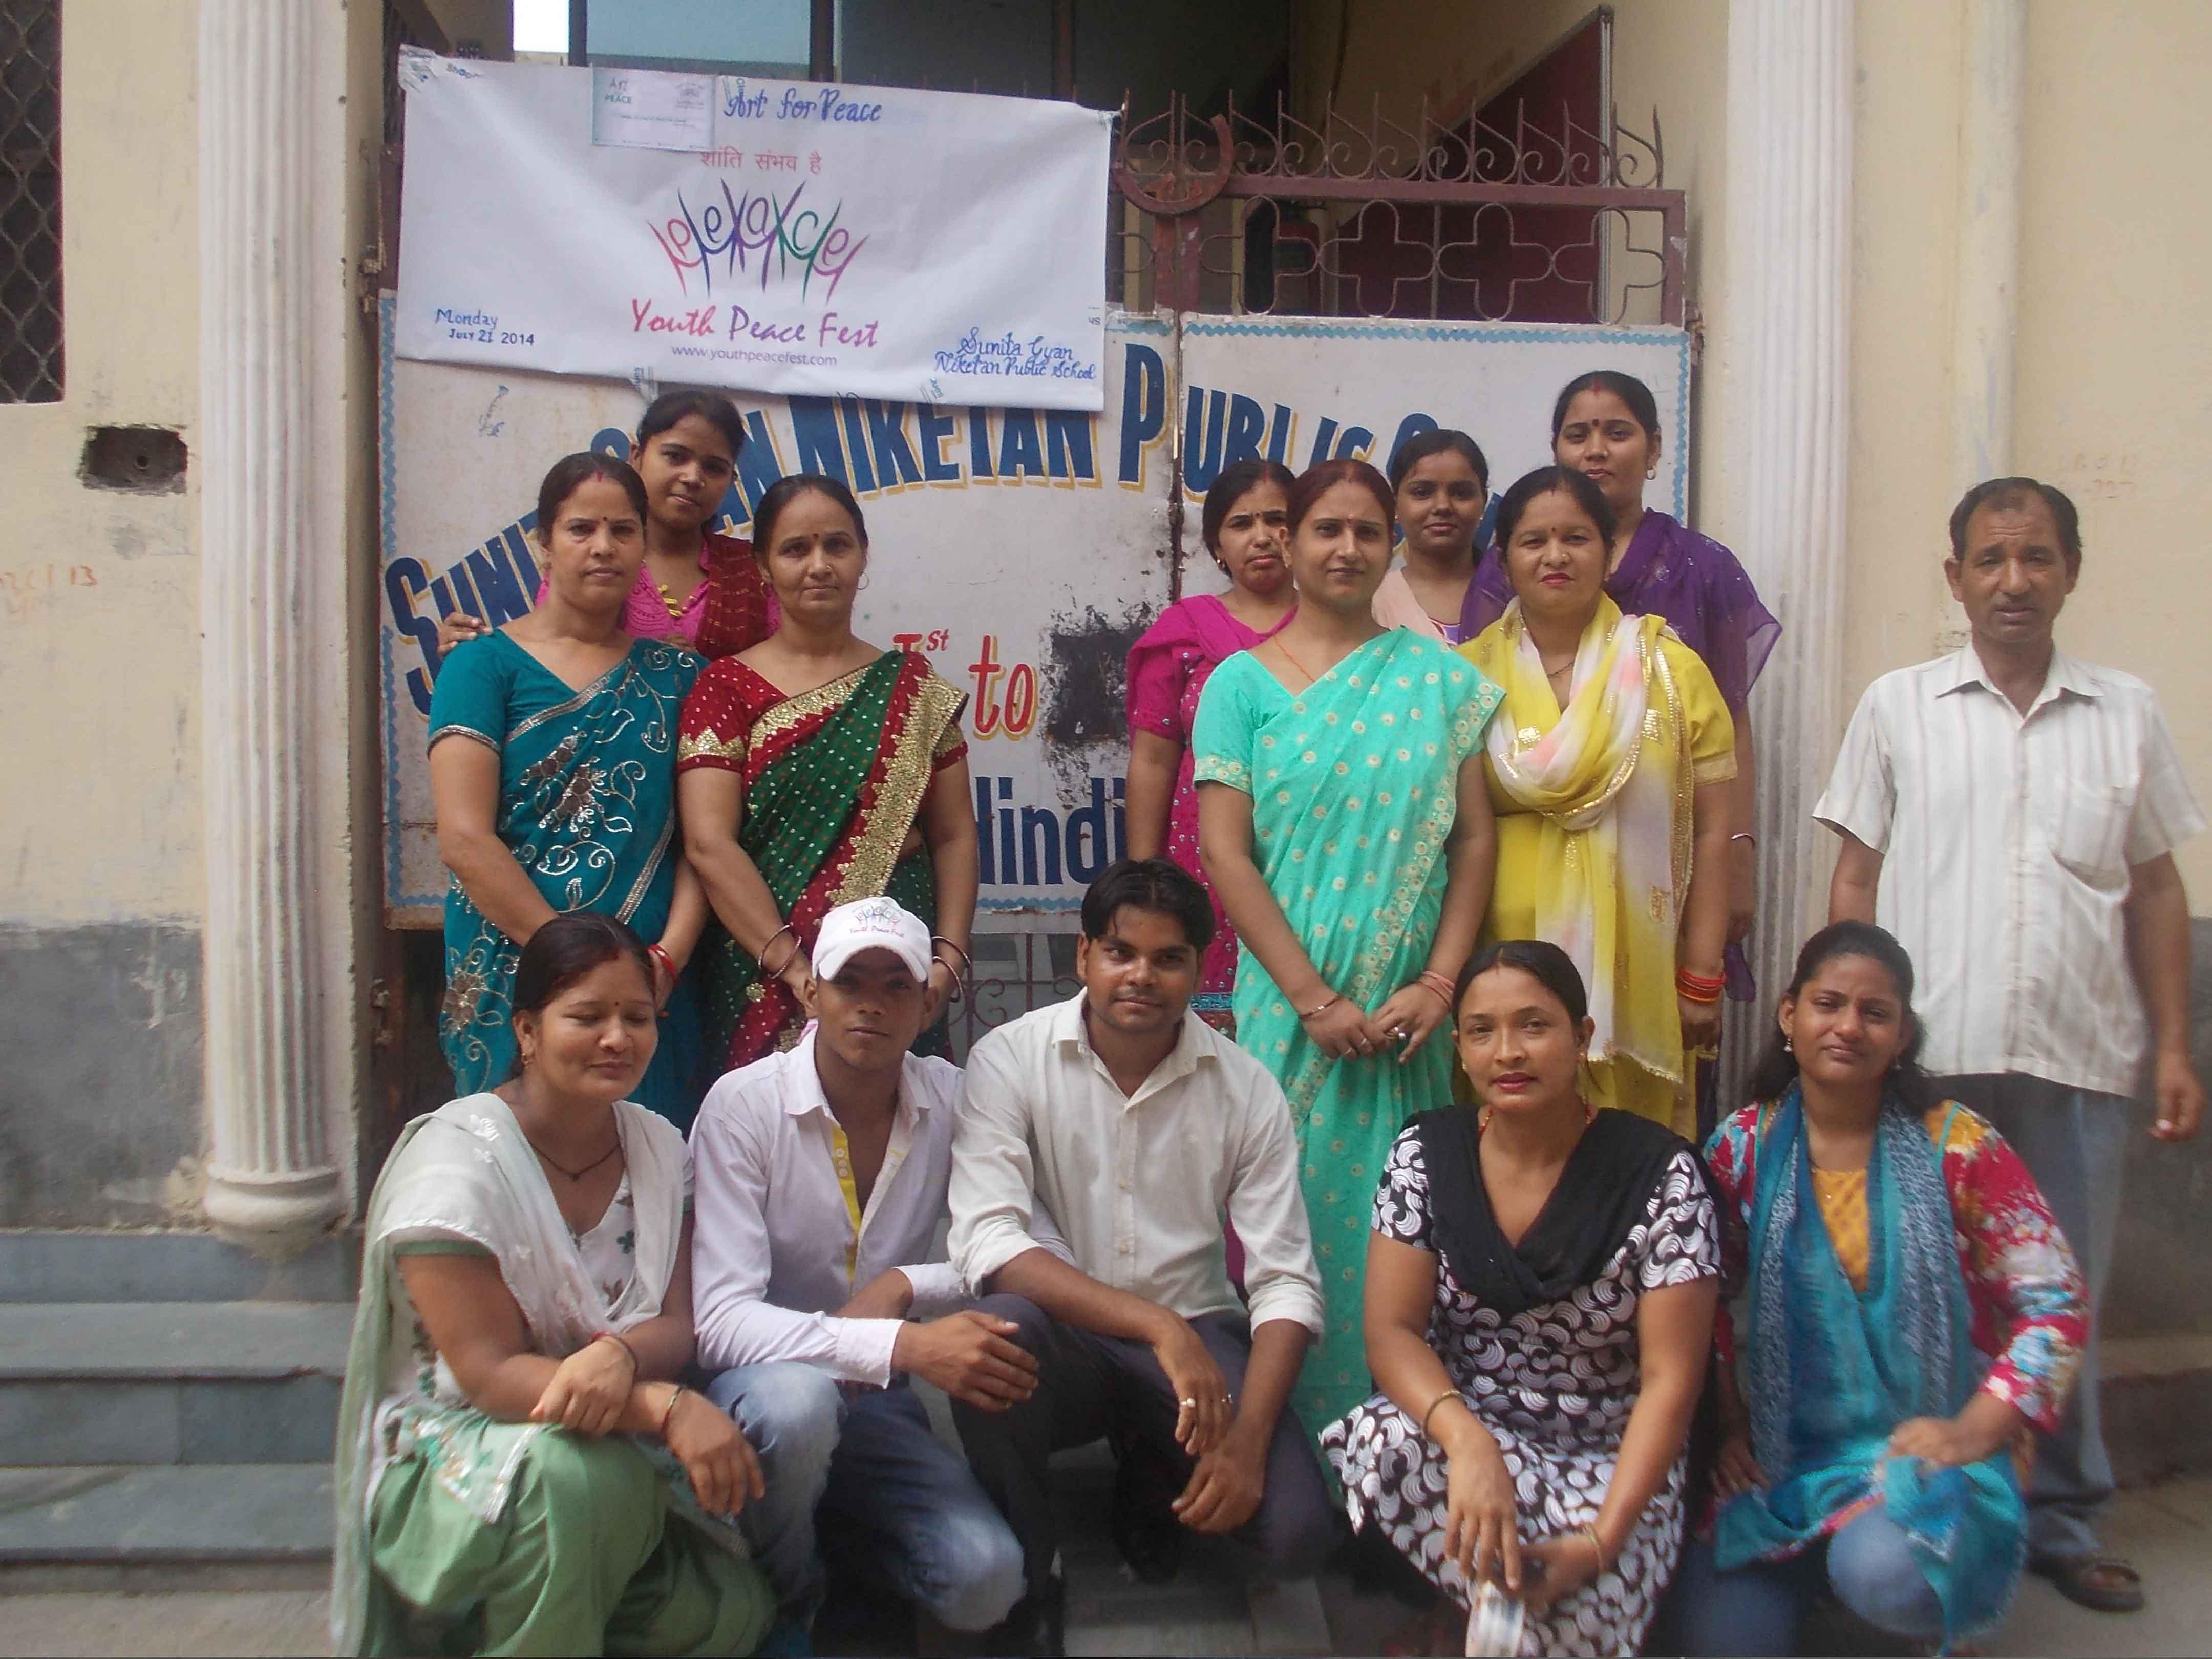 Sunita Gyan Niketan Public School, Roshanpura, New Delhi